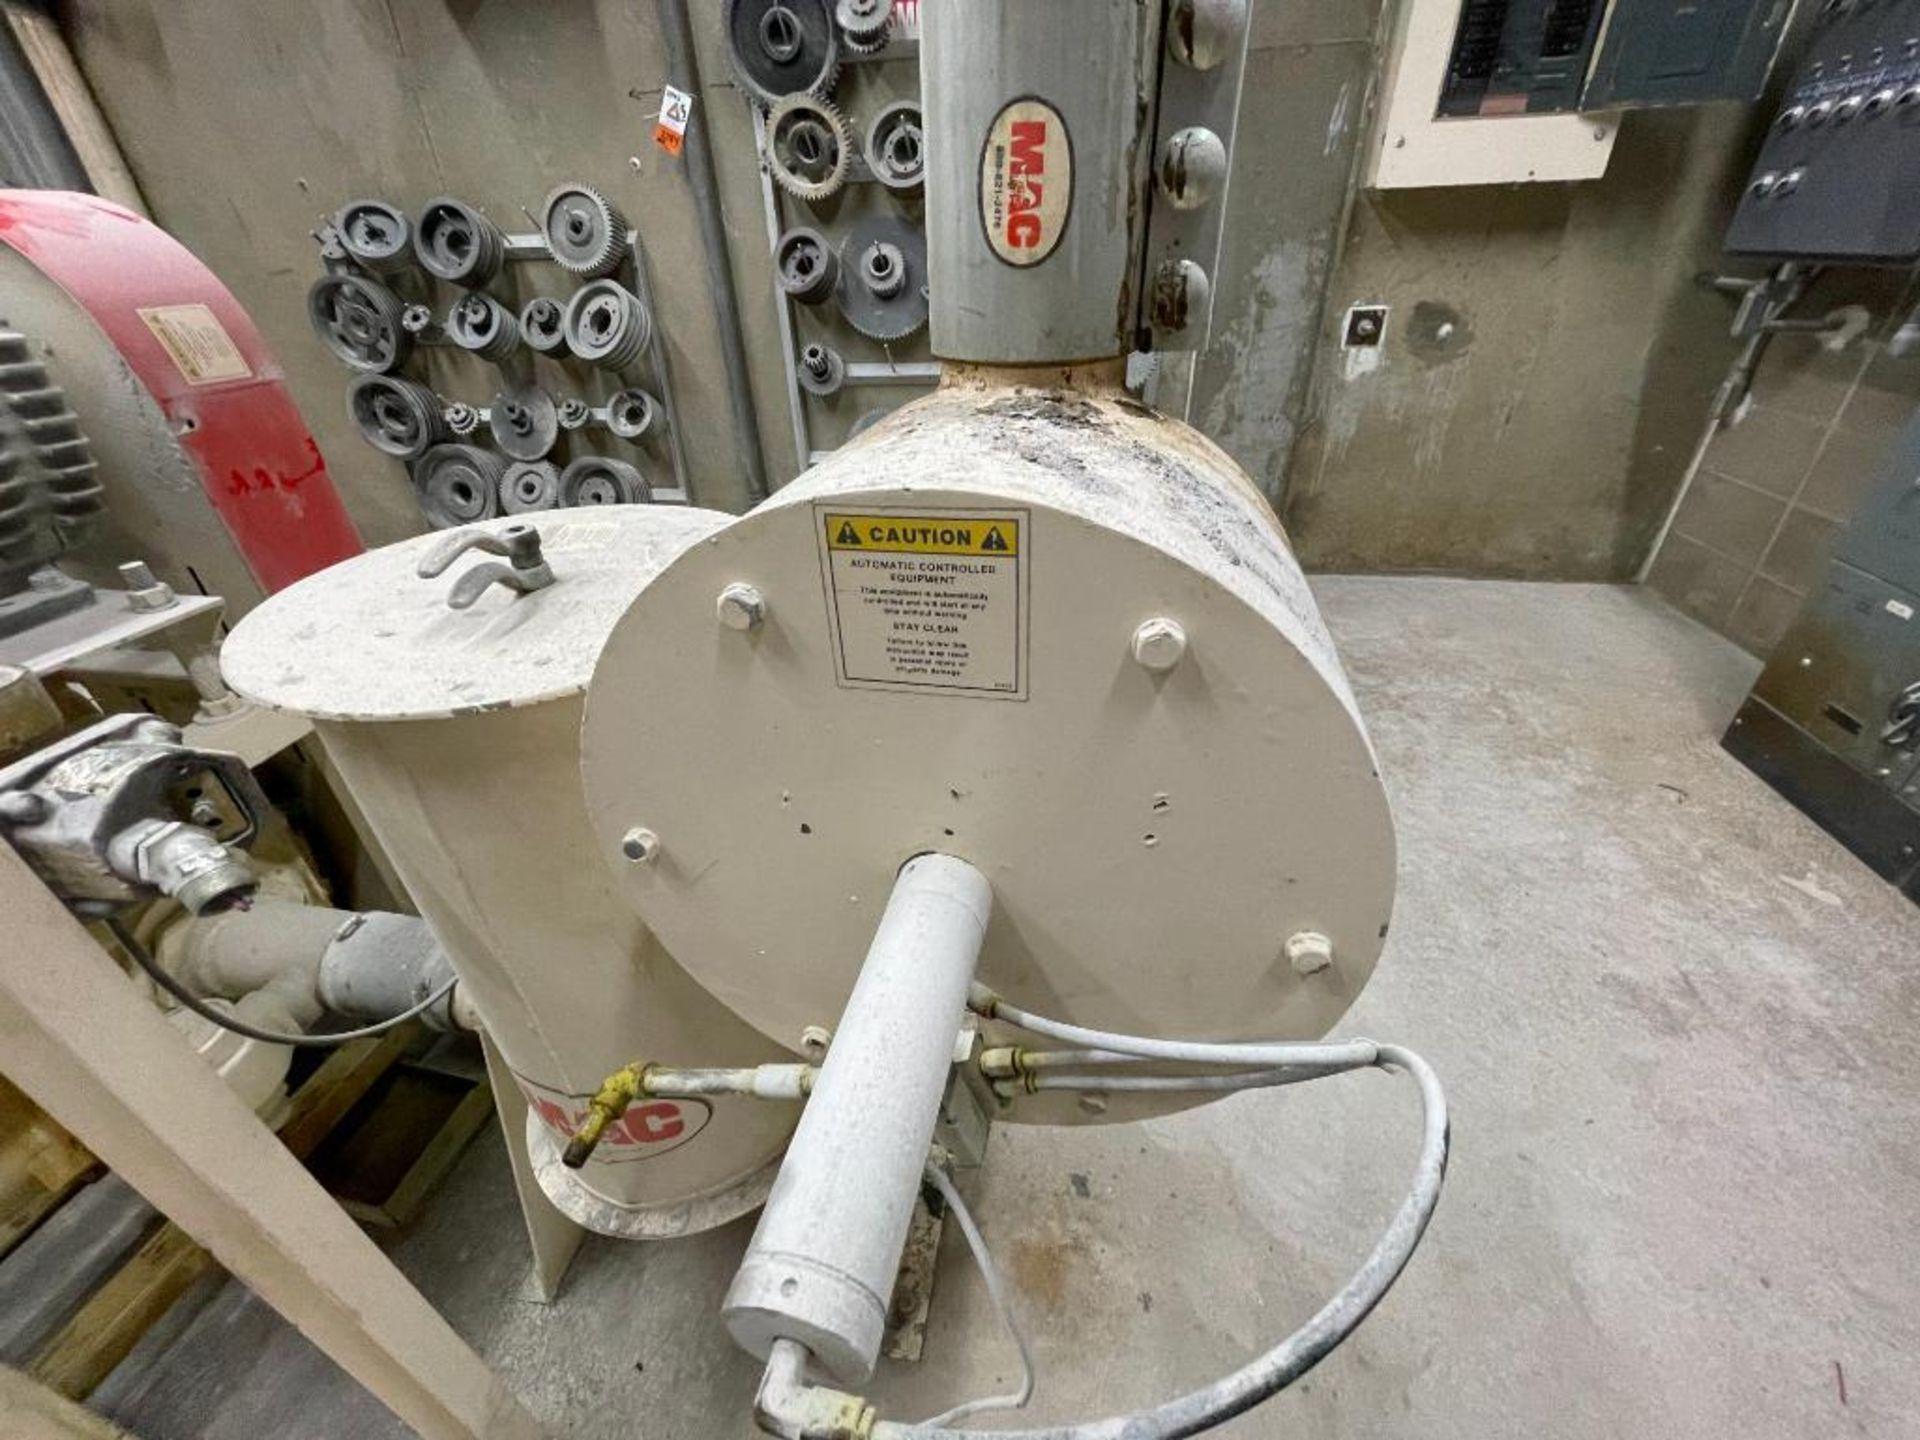 Sutorbilt rotary positive blower - Image 20 of 21